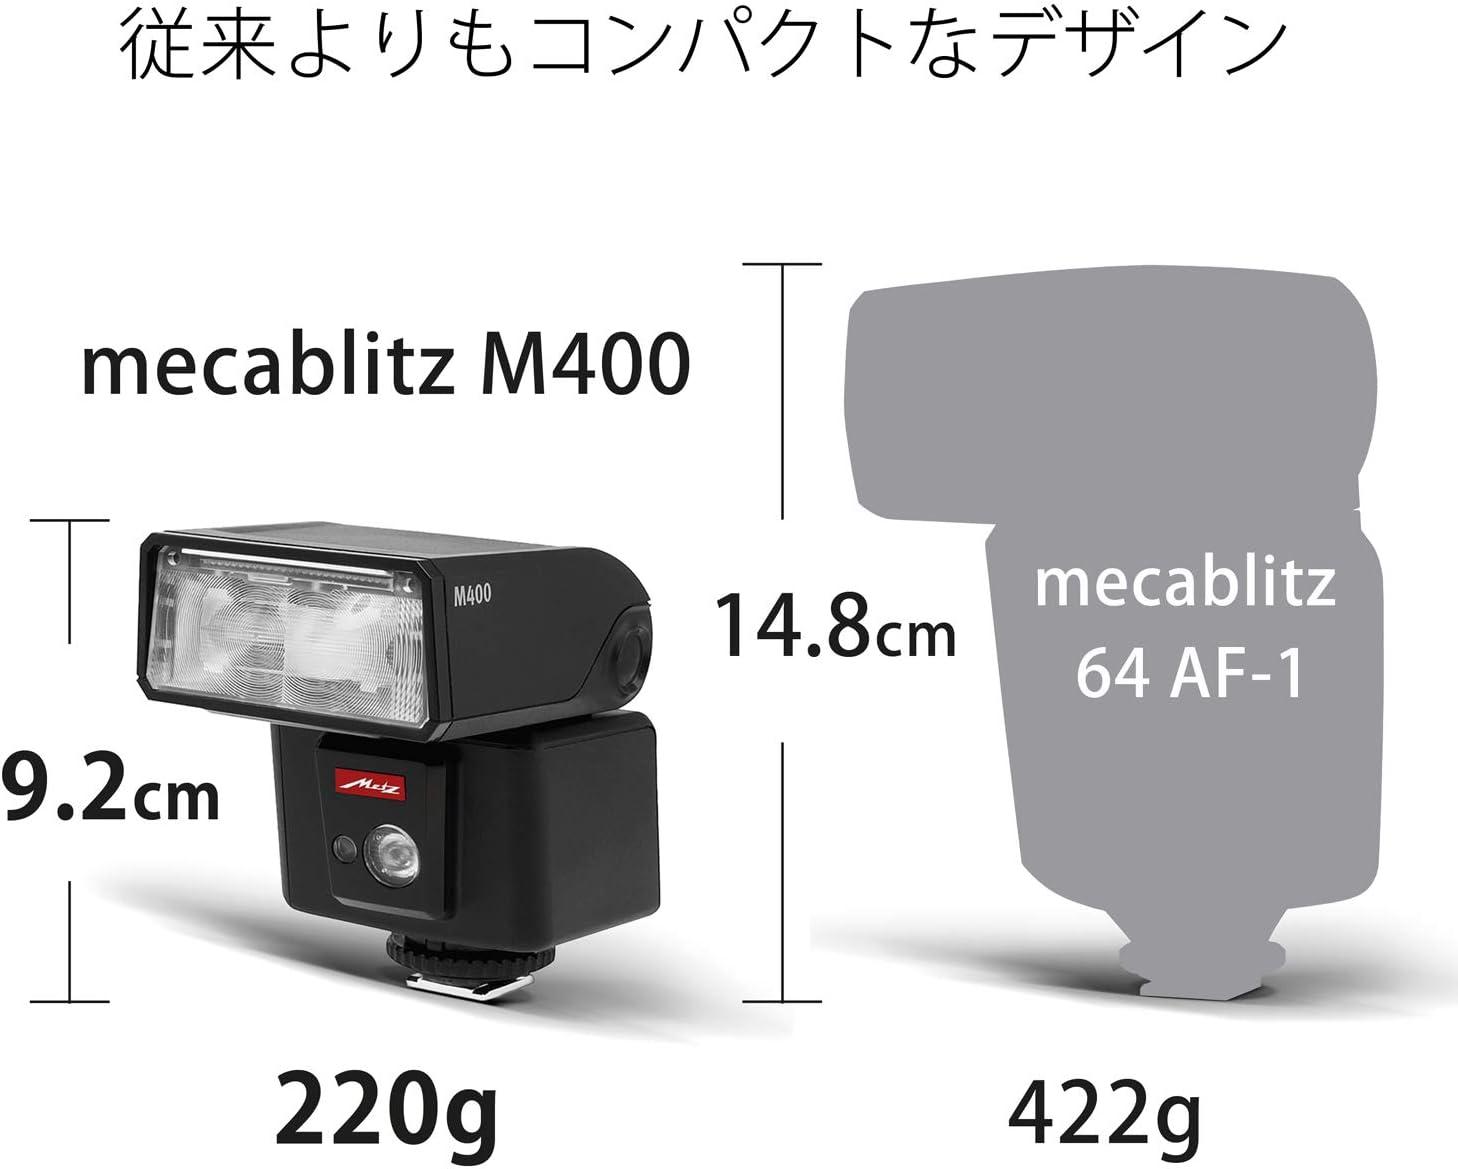 Metz Mecablitz M400 Für Sony Ultra Kompakter Kamera